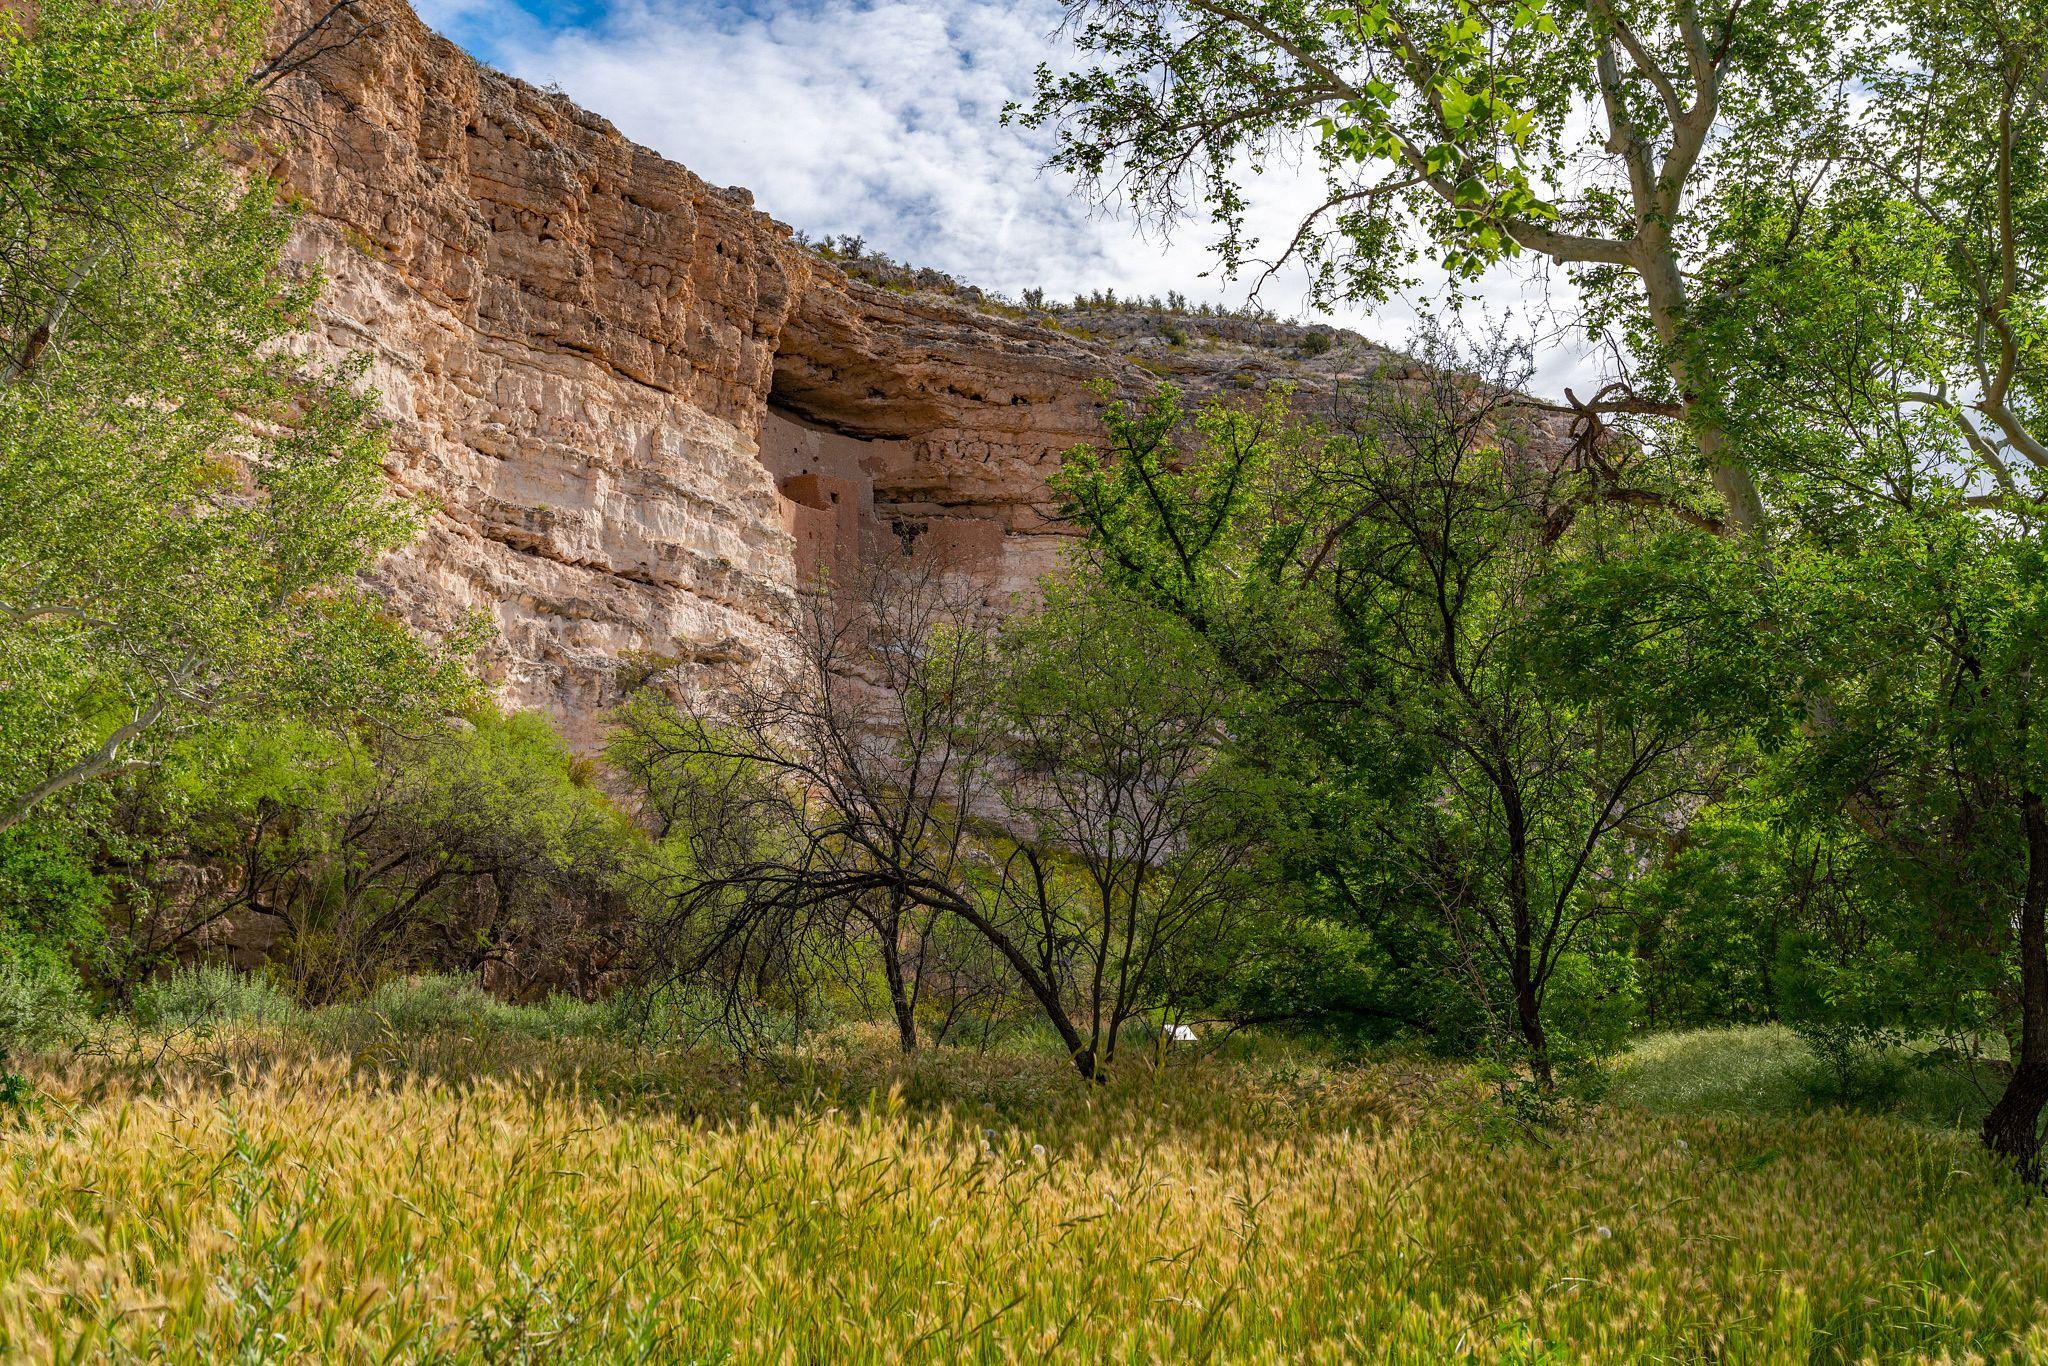 Montezuma Castle Cliff Dwellings